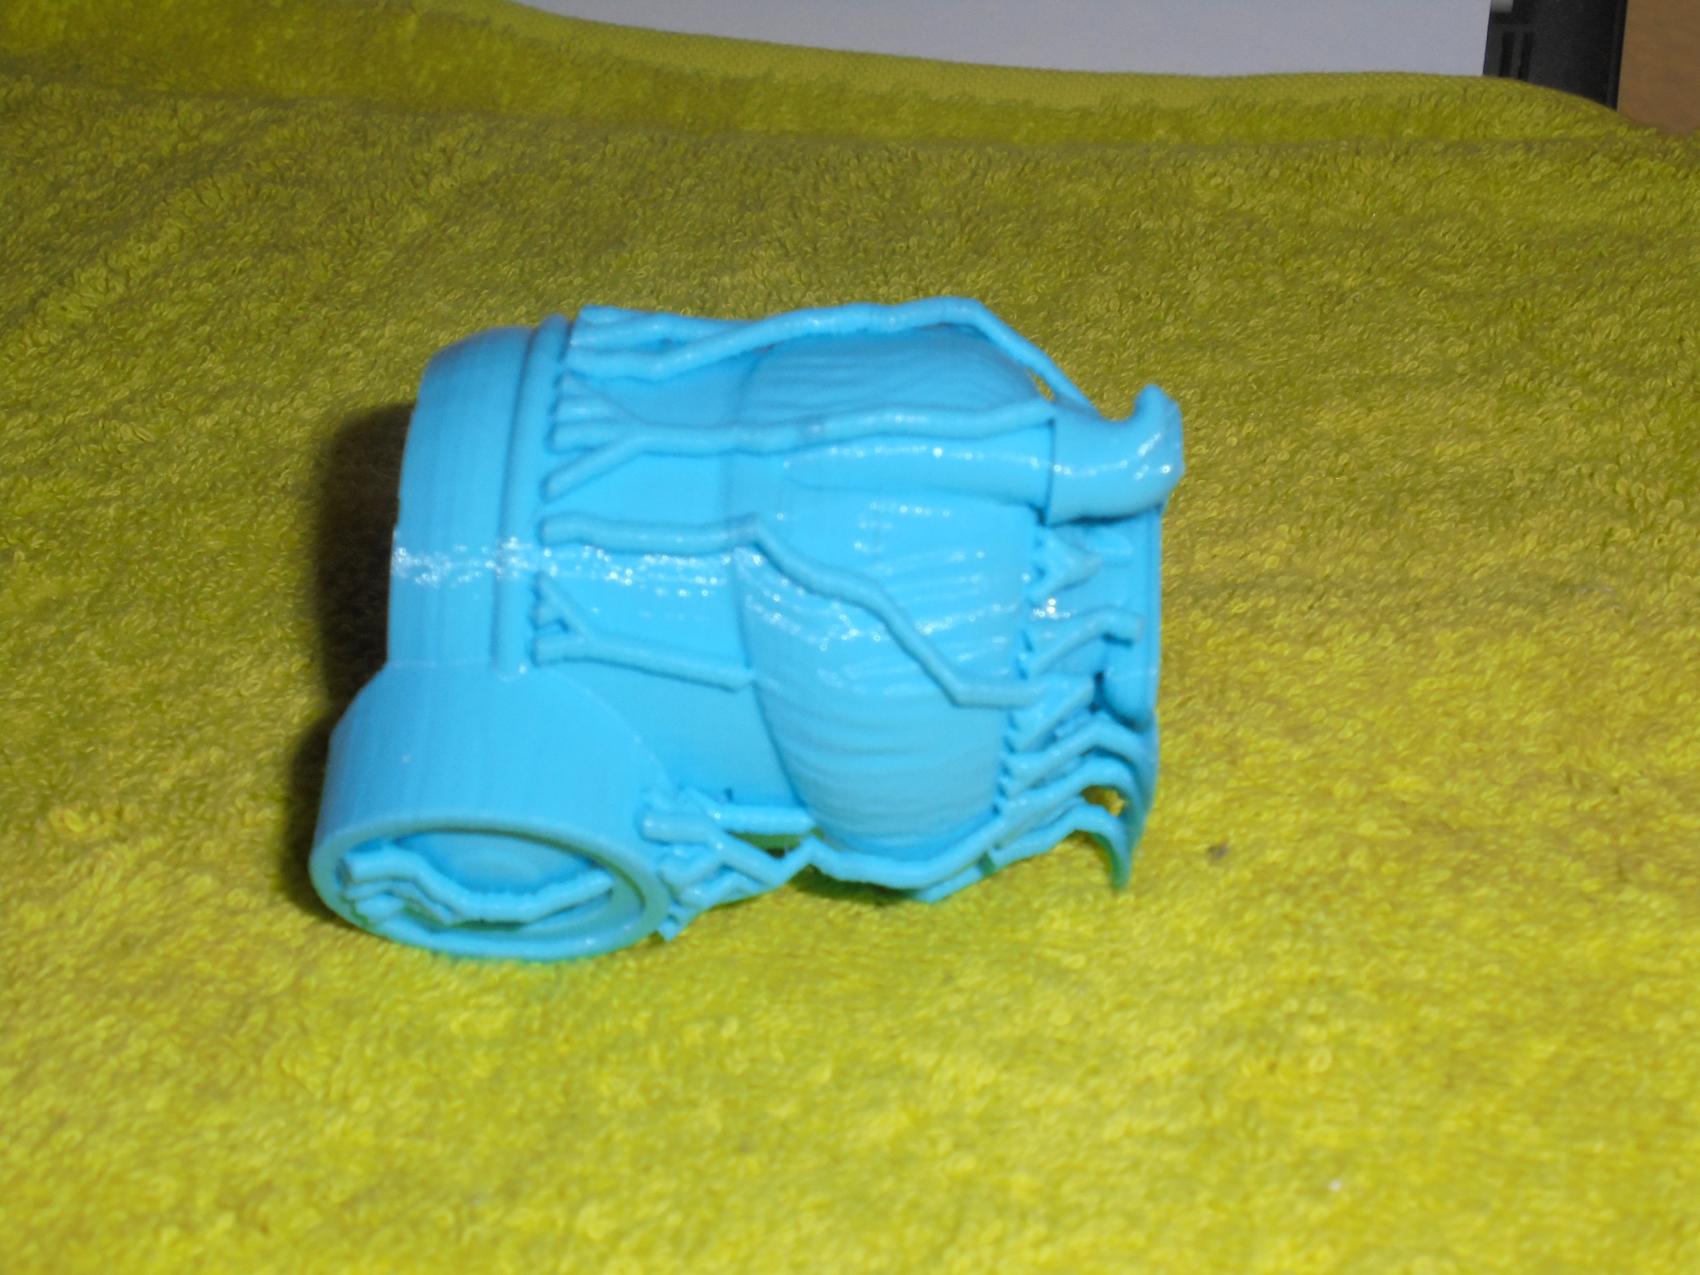 Impresora 3D - Bq Prusa i3 Hephestos-13.jpg